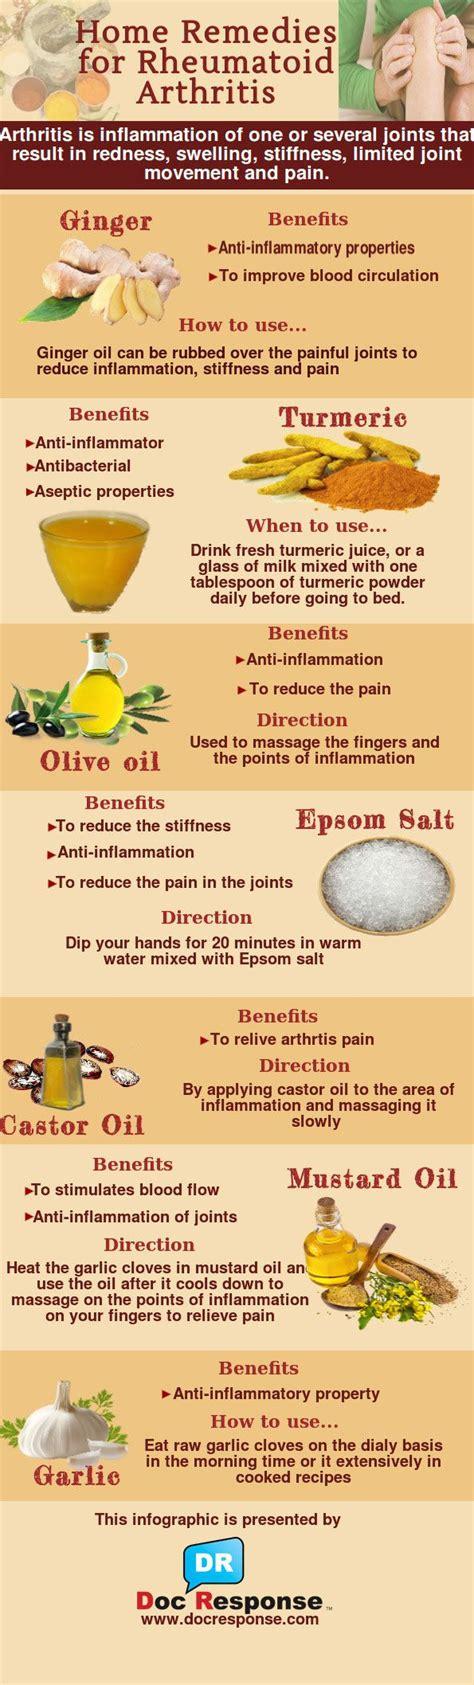 herbal remedies rheumatoid arthritis picture 1